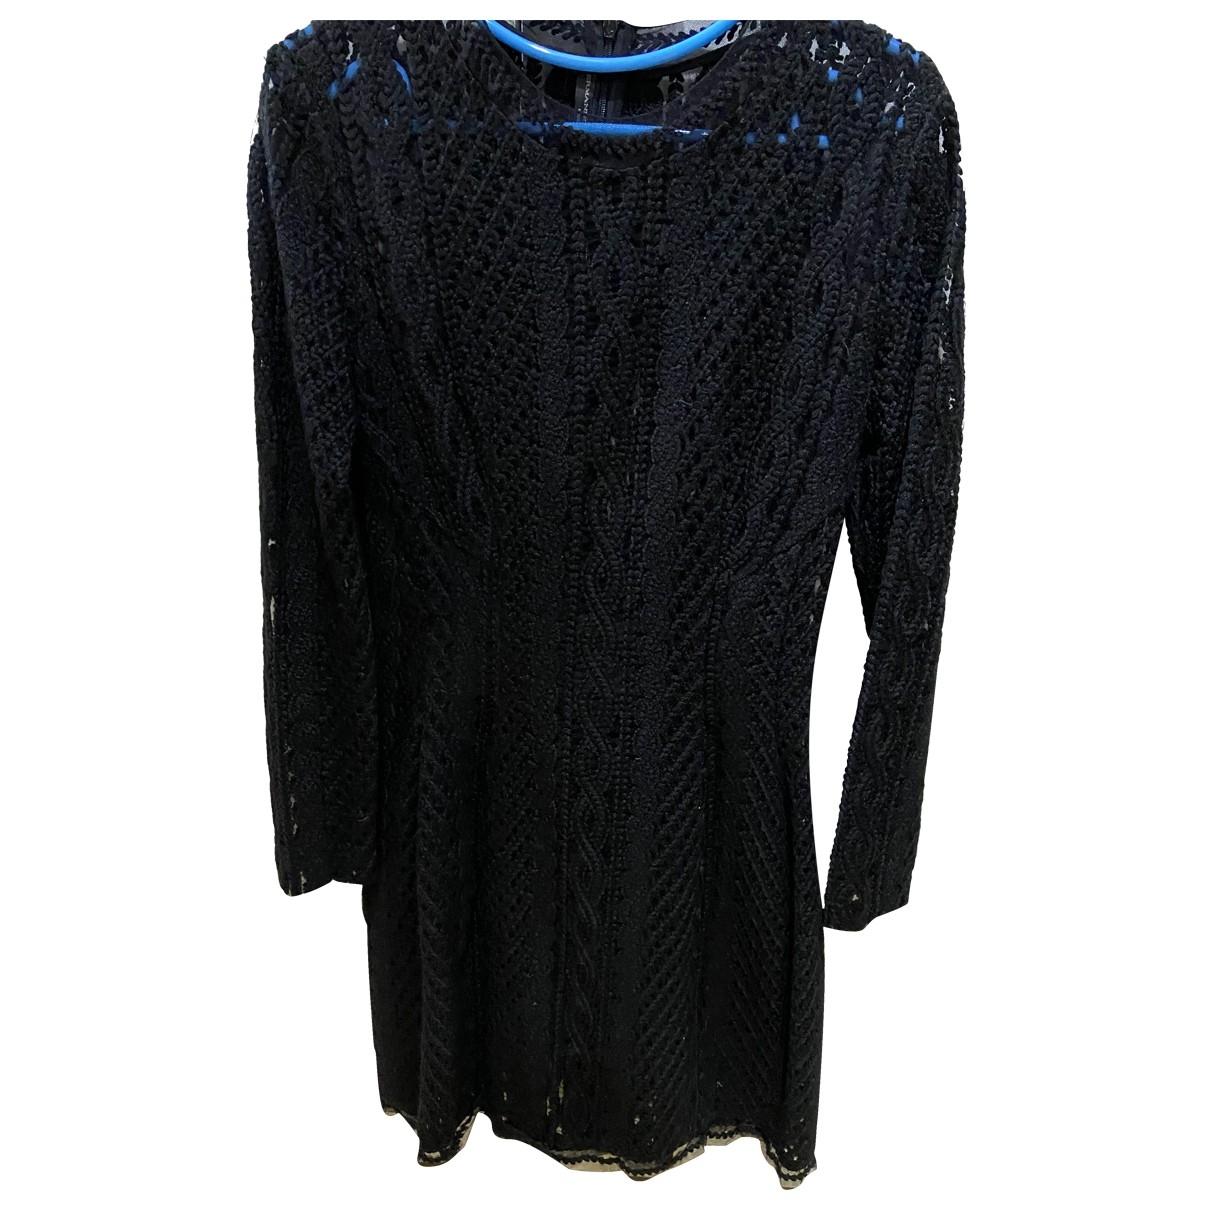 Ermanno Scervino \N Black Wool dress for Women 40 IT